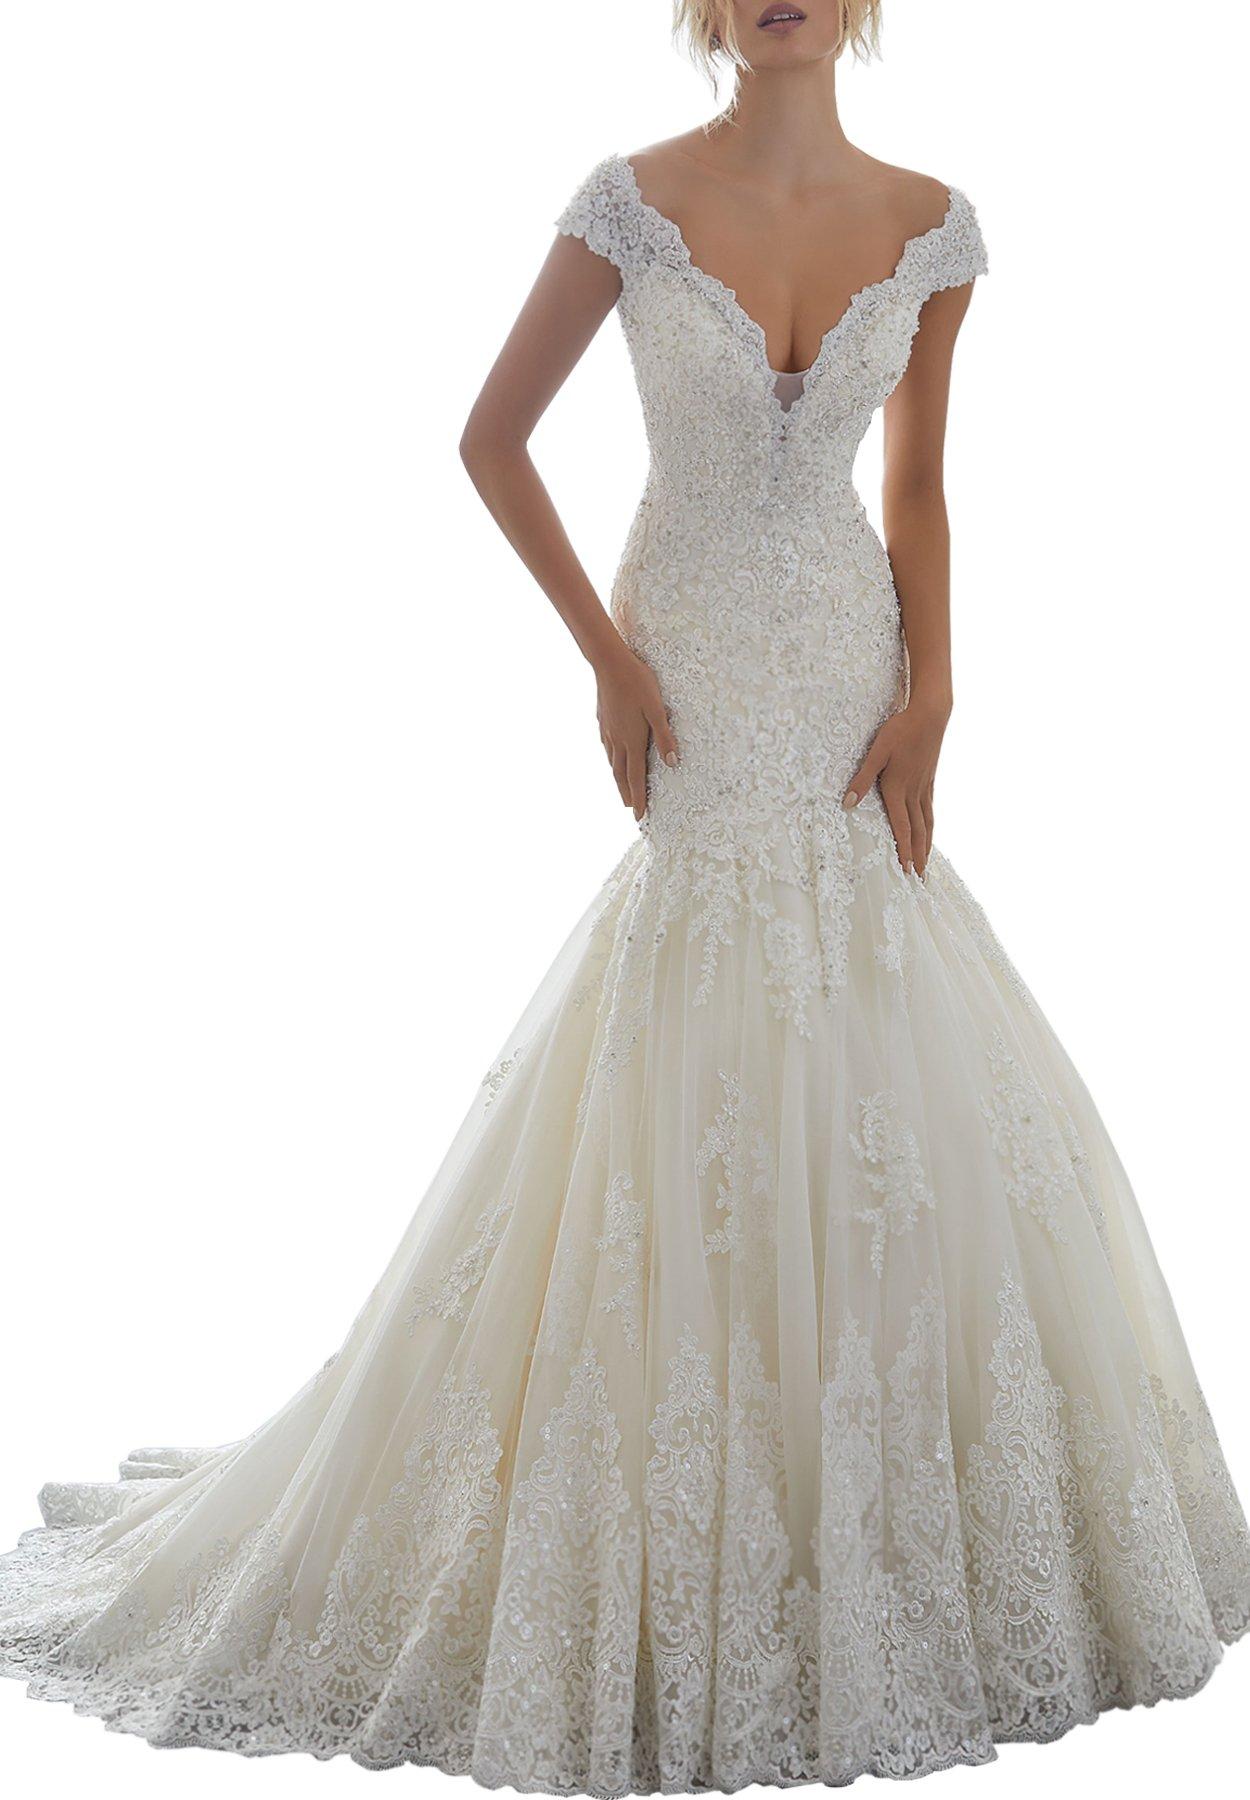 Beauty Bridal Women's V-neck Off Shoulder Beaded Lace Mermaid Wedding Dresses for Bride 2018 S032 (10,Ivory)